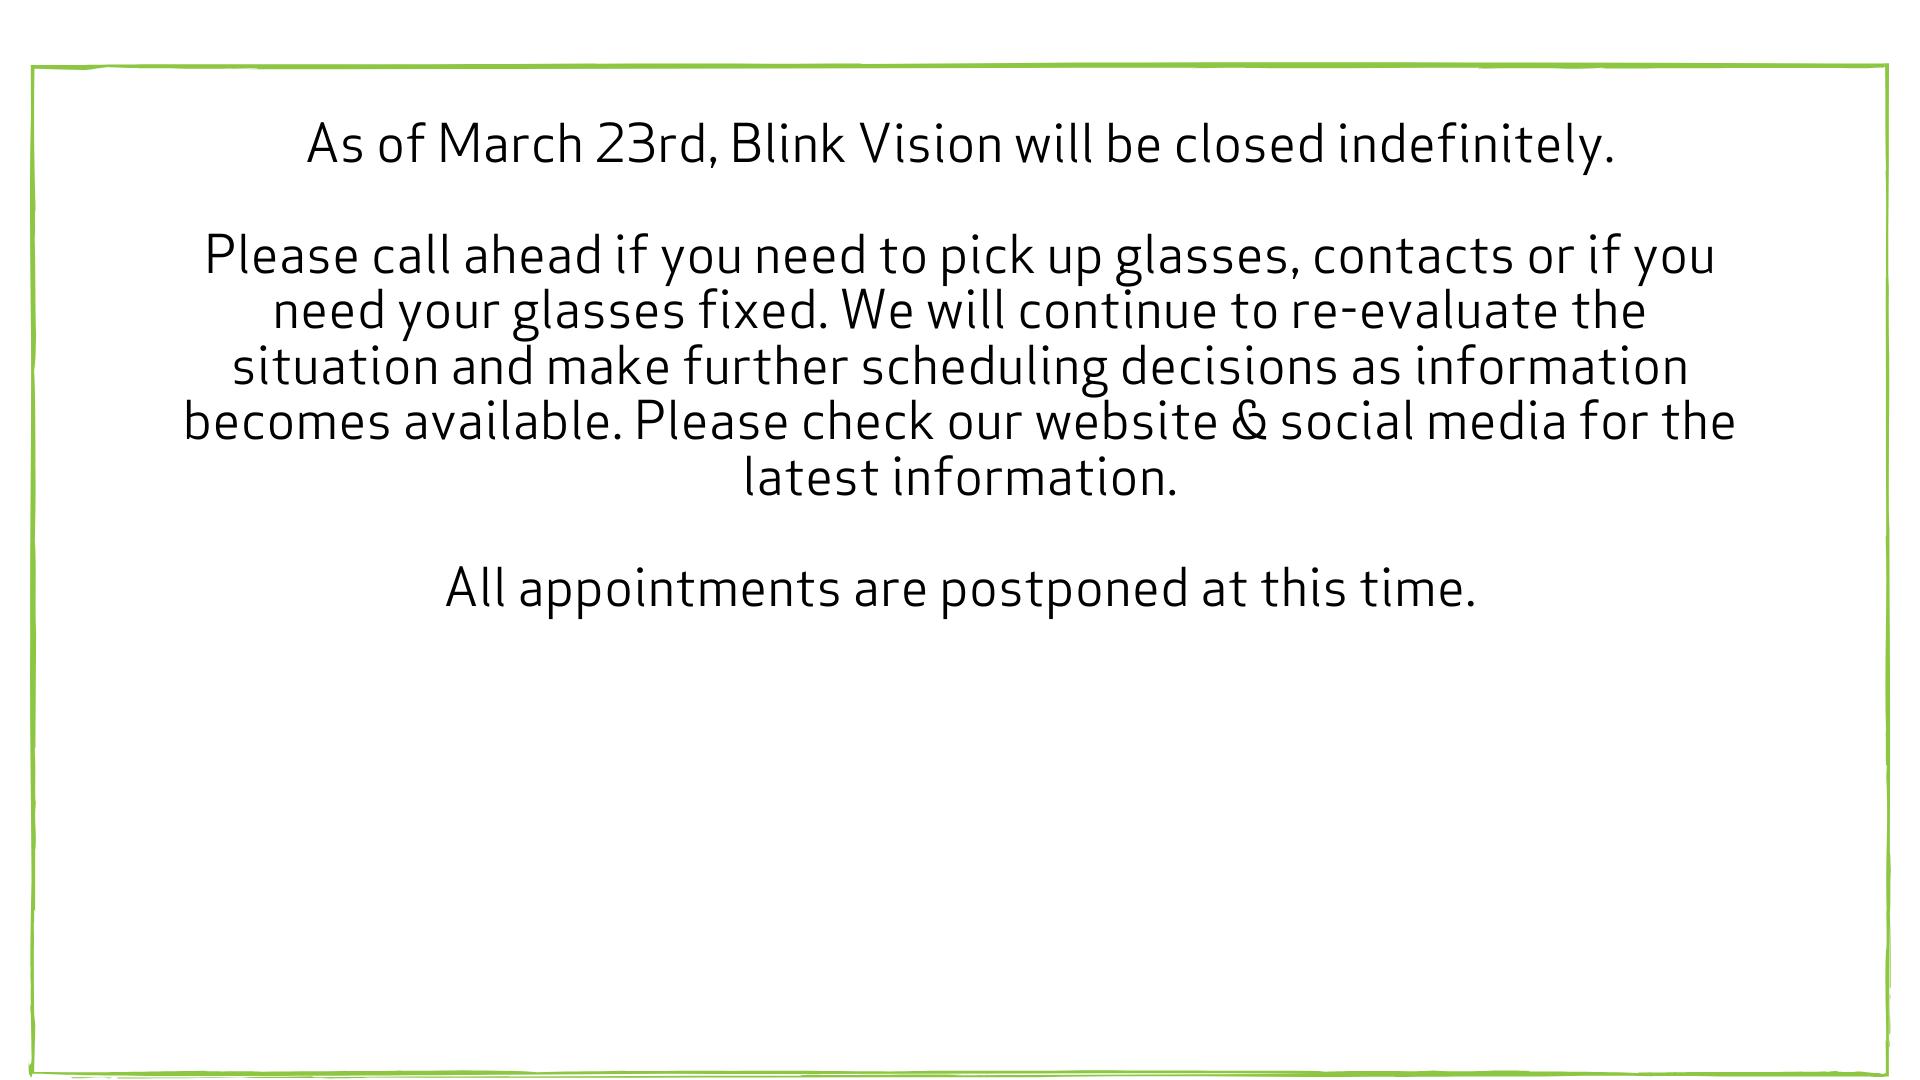 Blink_COVIDCLOSURE_WebsiteUpdatedMarch23